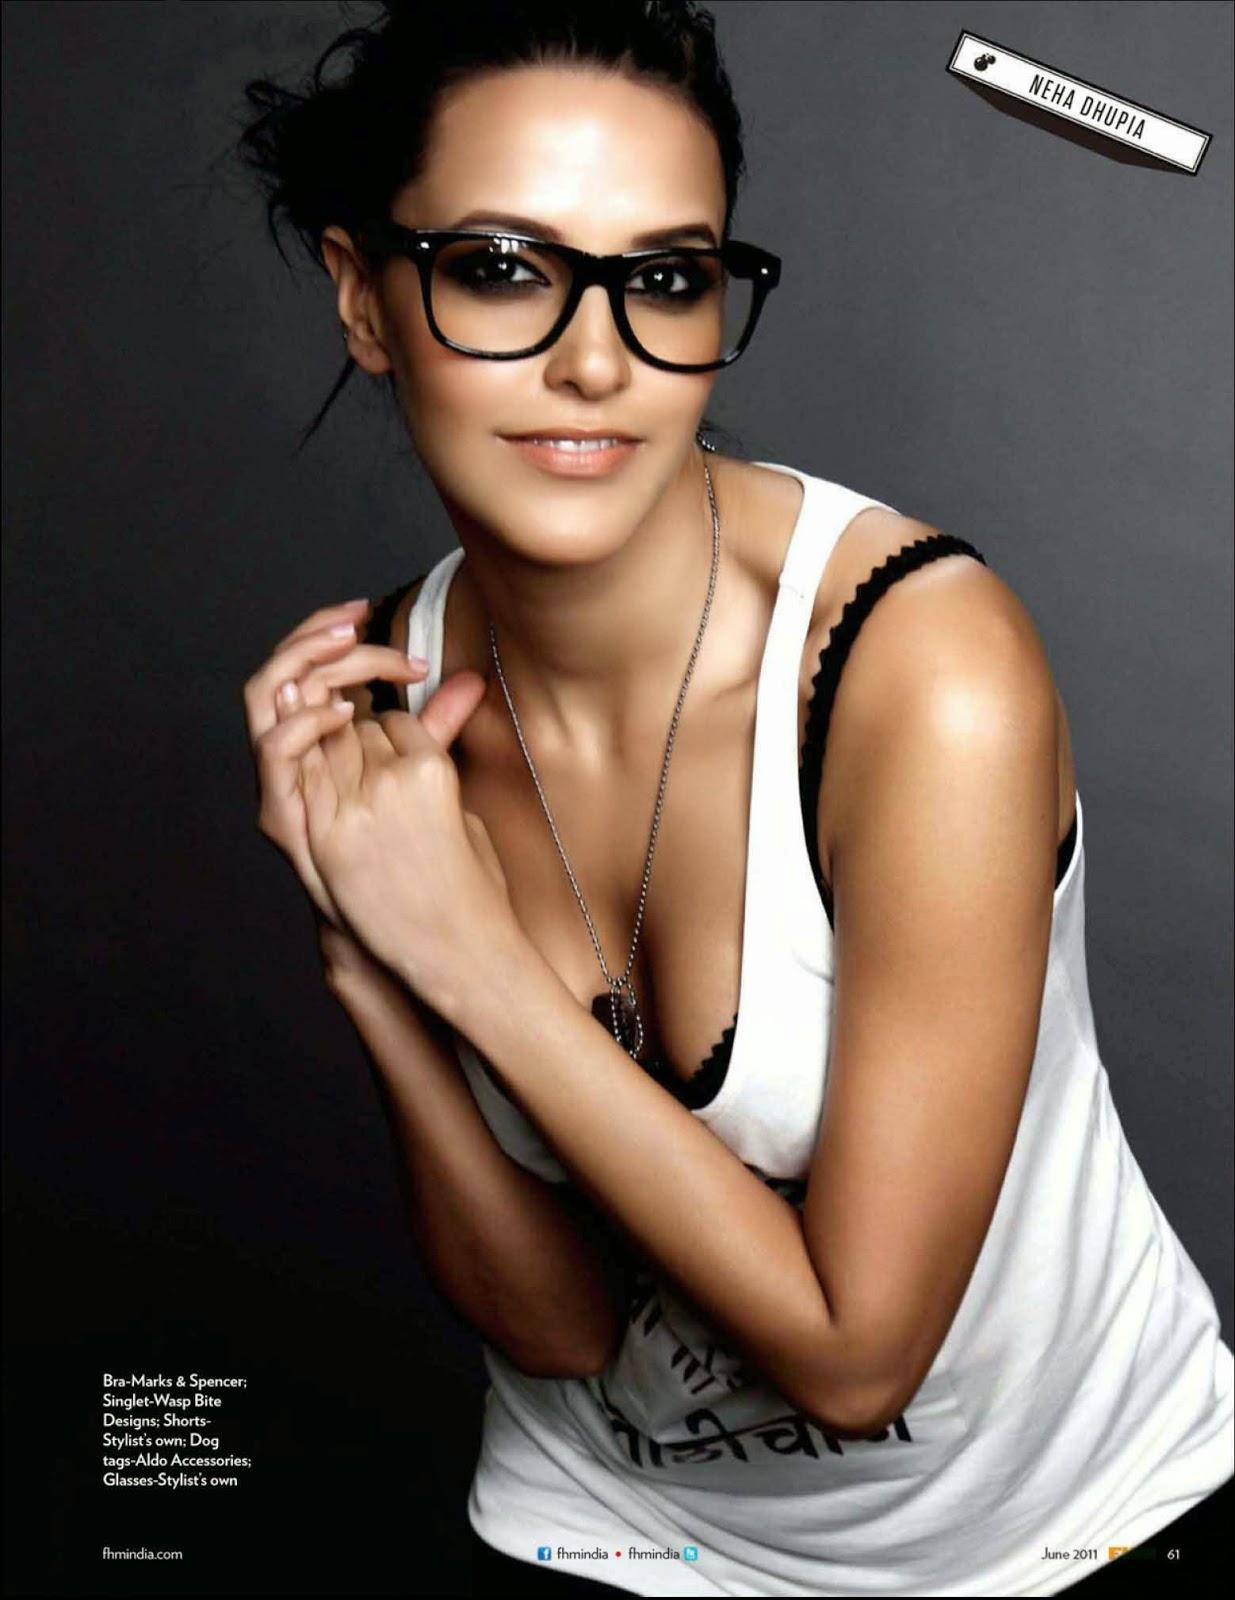 Neha Dhupia in white vest in FHM India July 2011 Magazine photoshoot